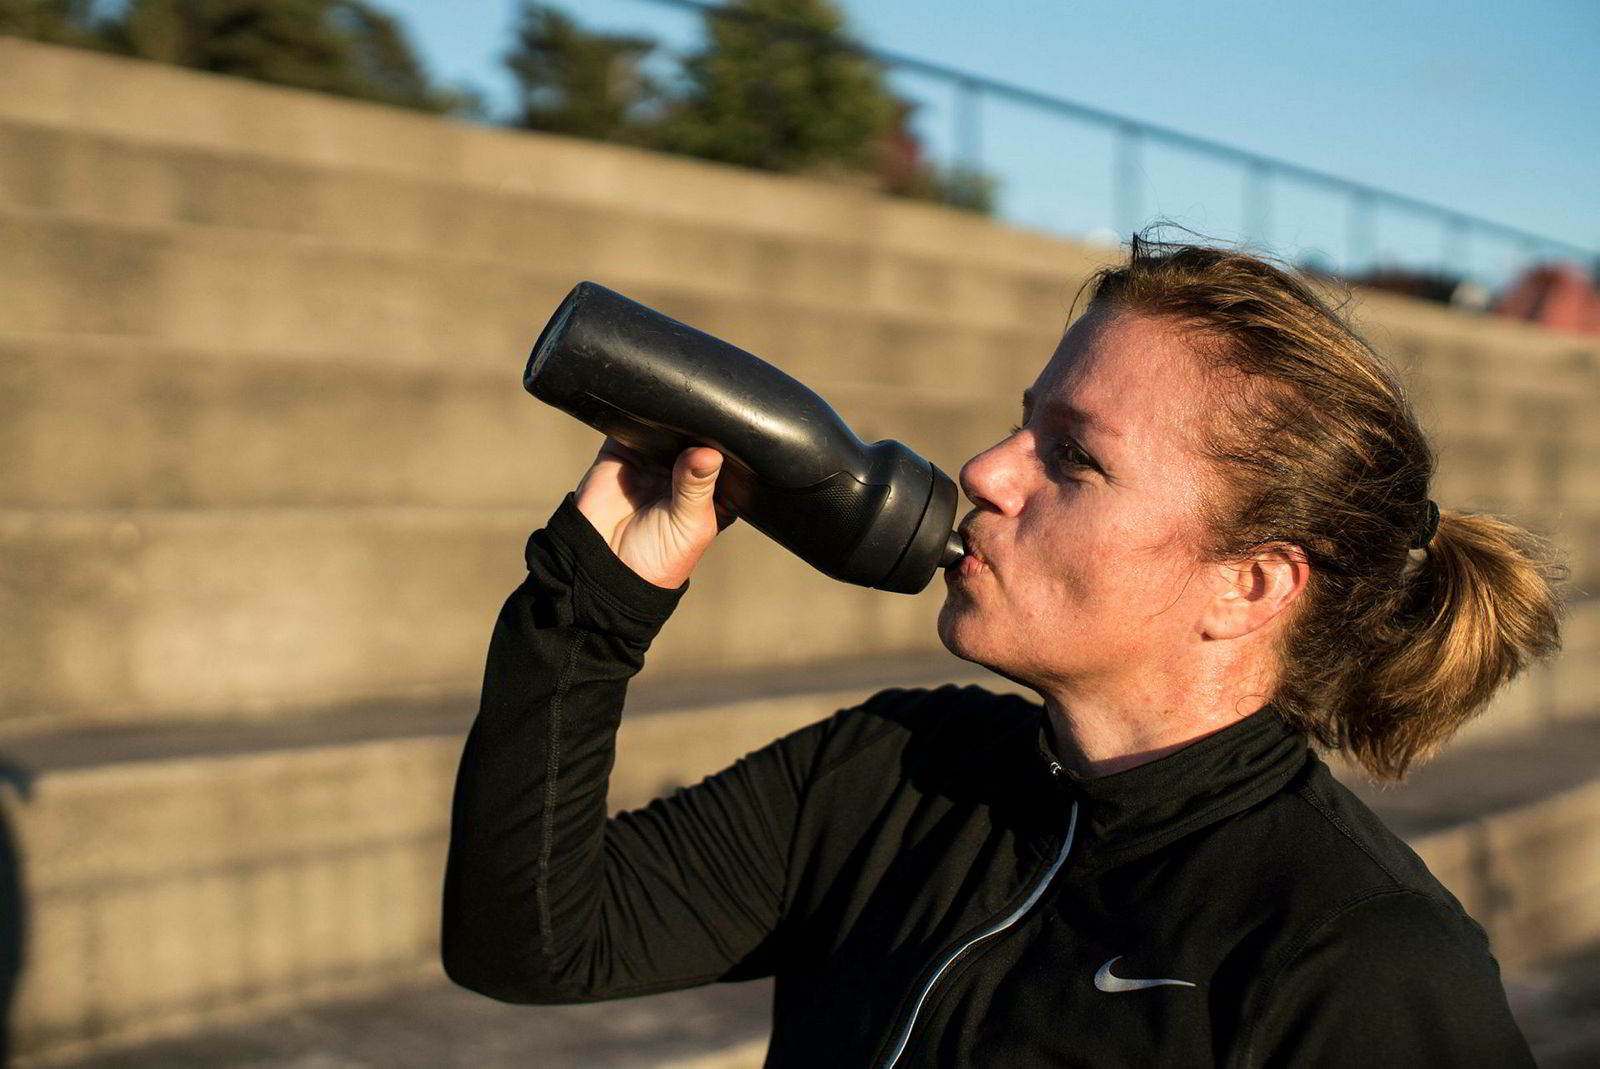 Ina Jagtøien begynte med trappetrening da hun fikk problemer med akillessenen og trengte en treningsform som var skånsom, men samtidig fikk opp pulsen.